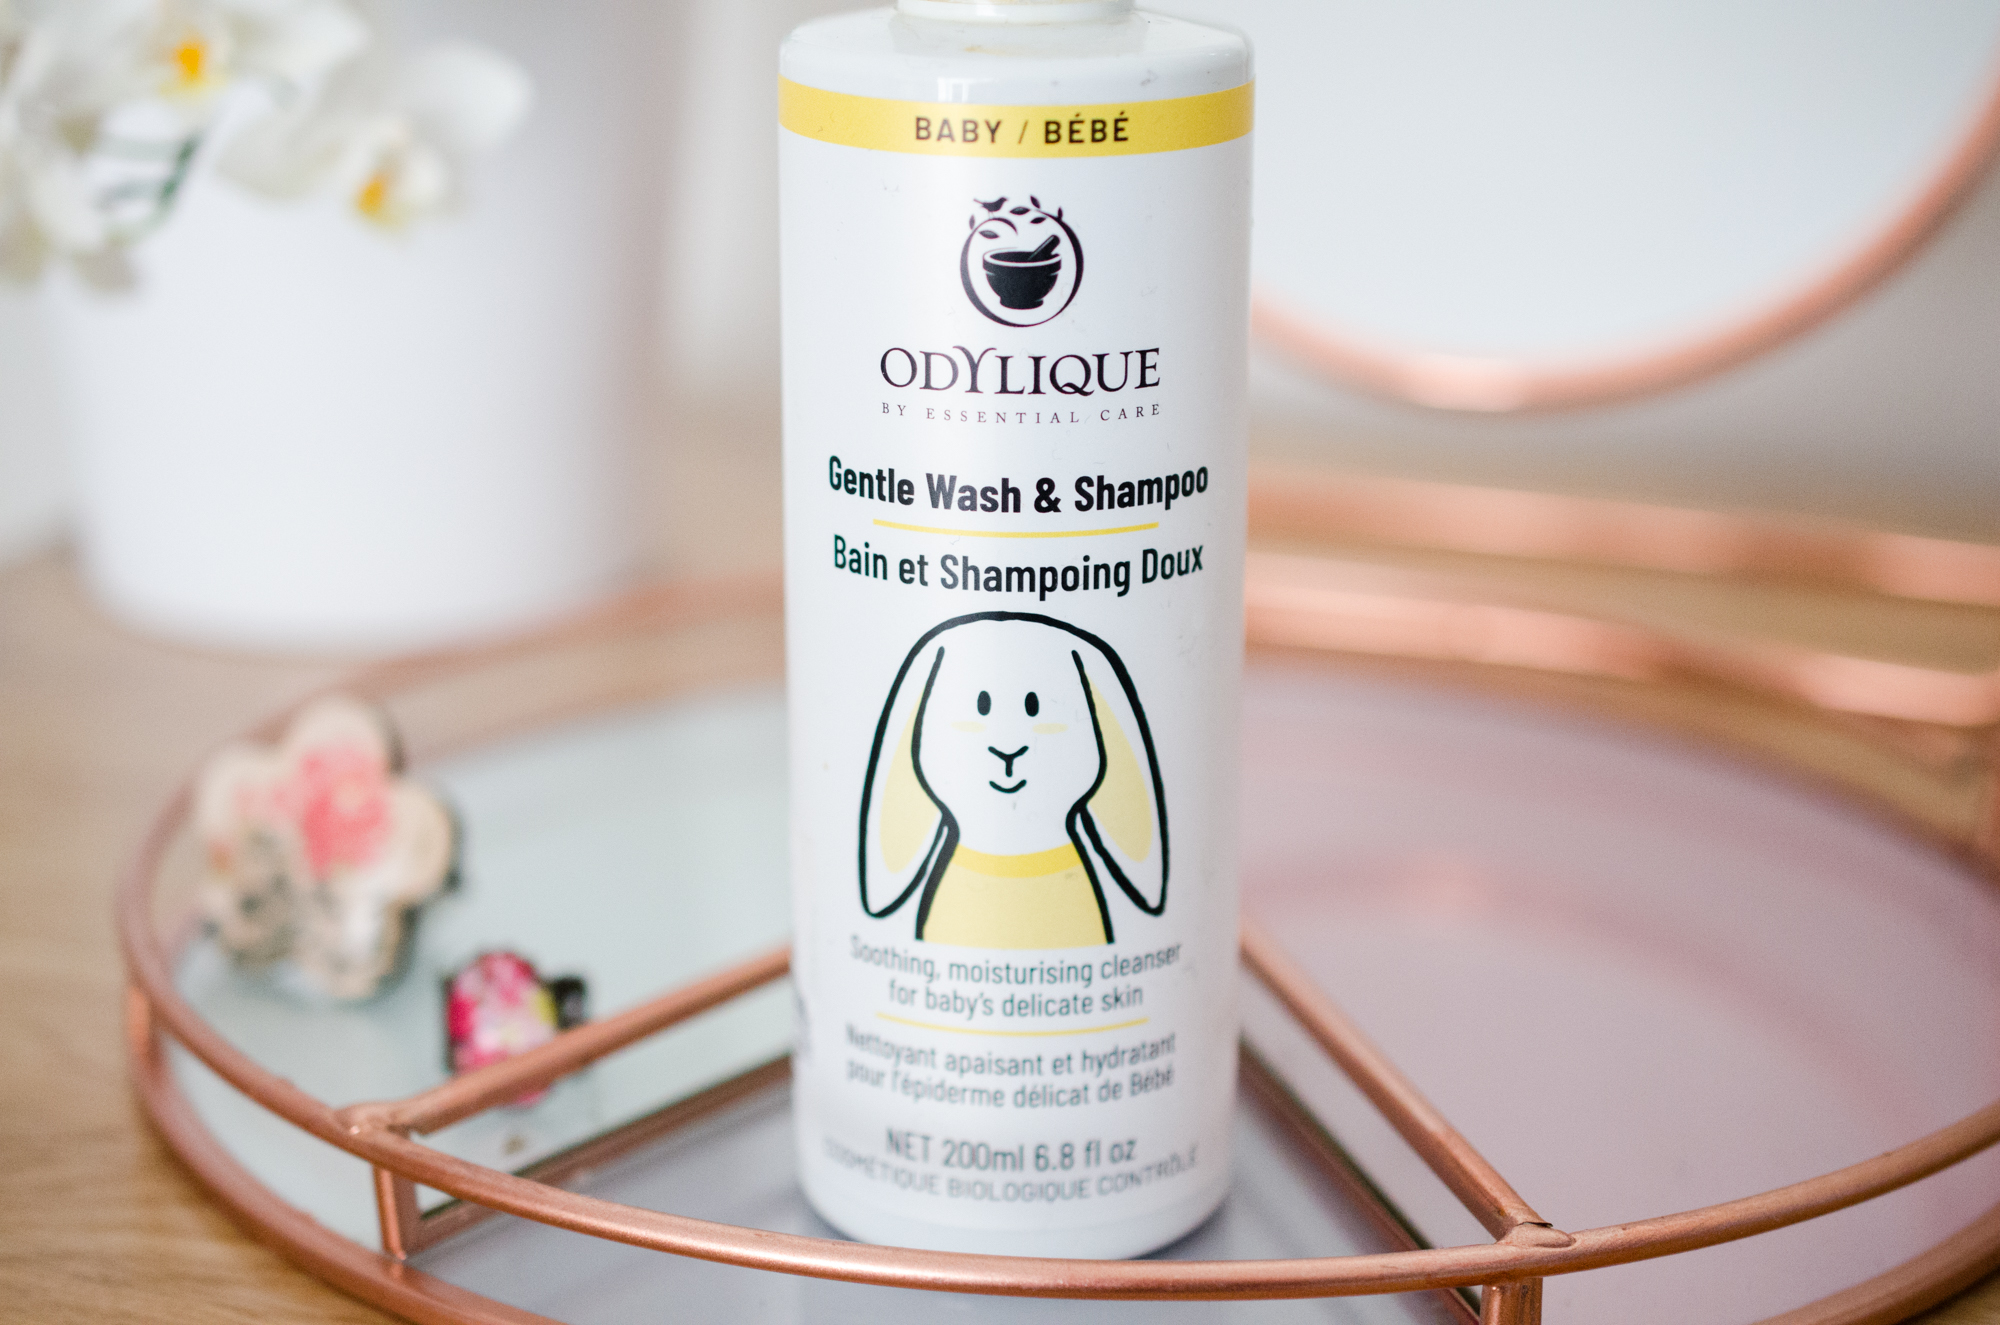 Odylique Gentle Wash & Shampoo